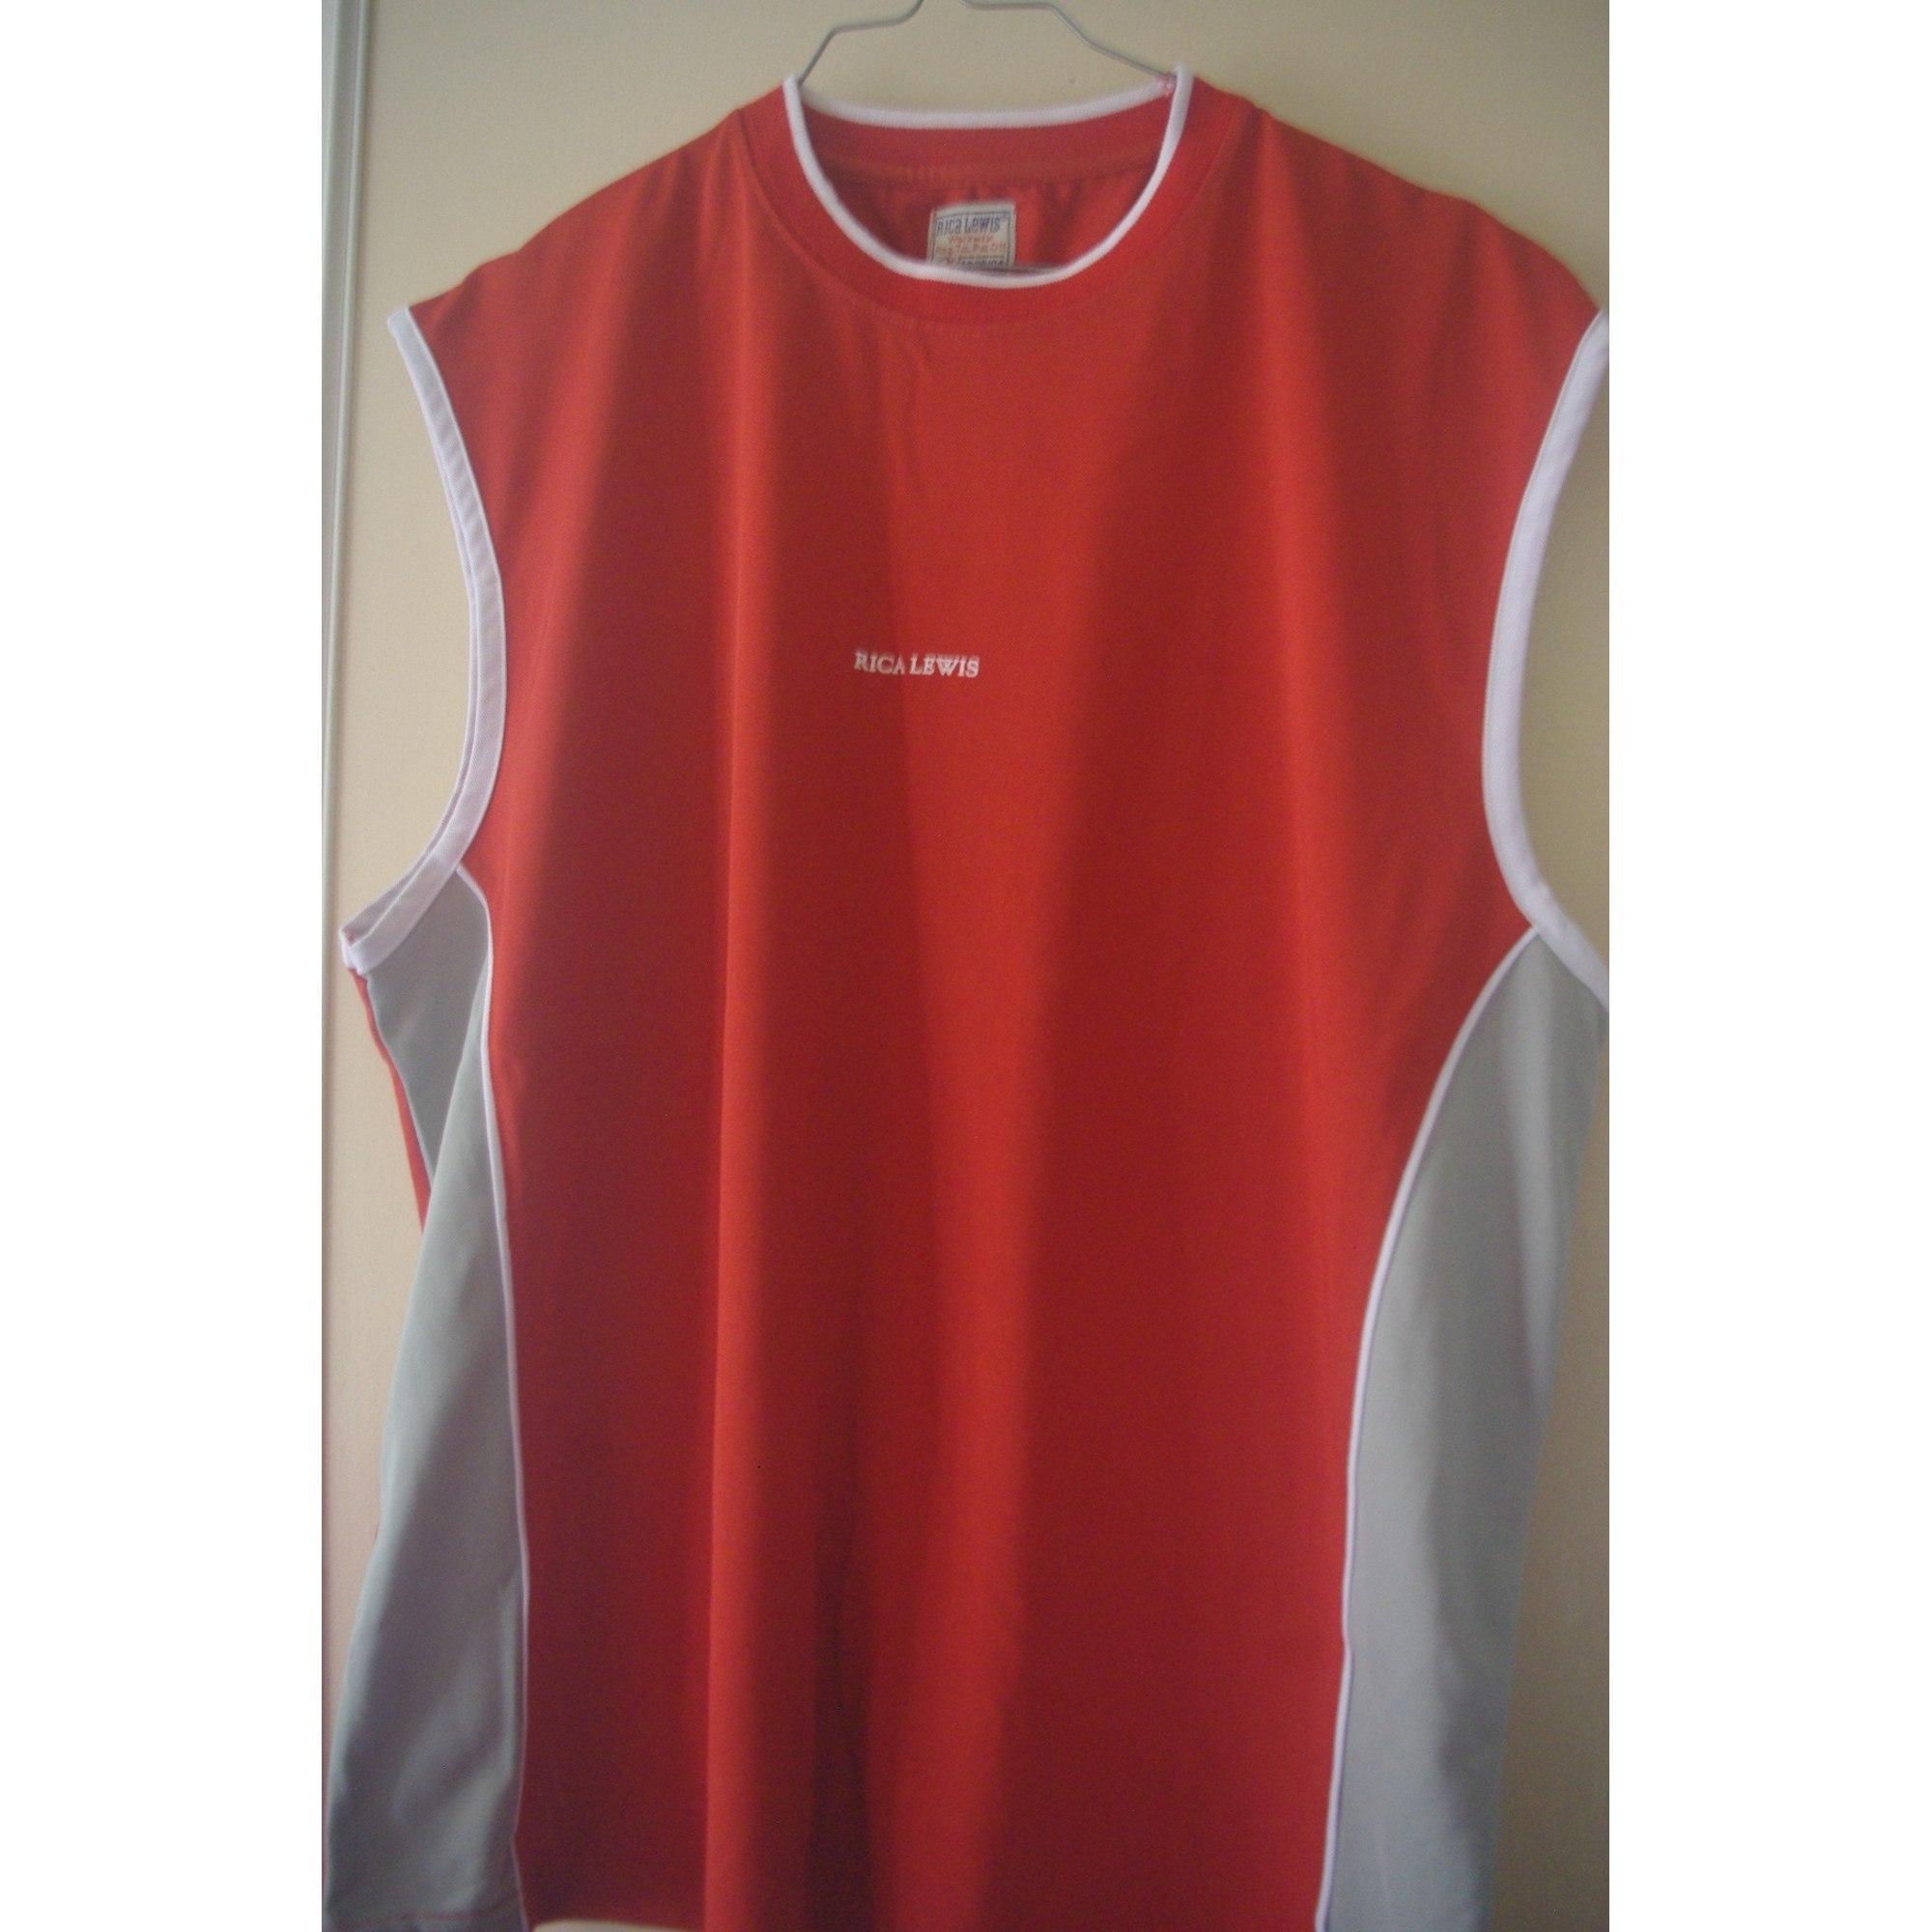 Tee-shirt RICA LEWIS Rouge, bordeaux